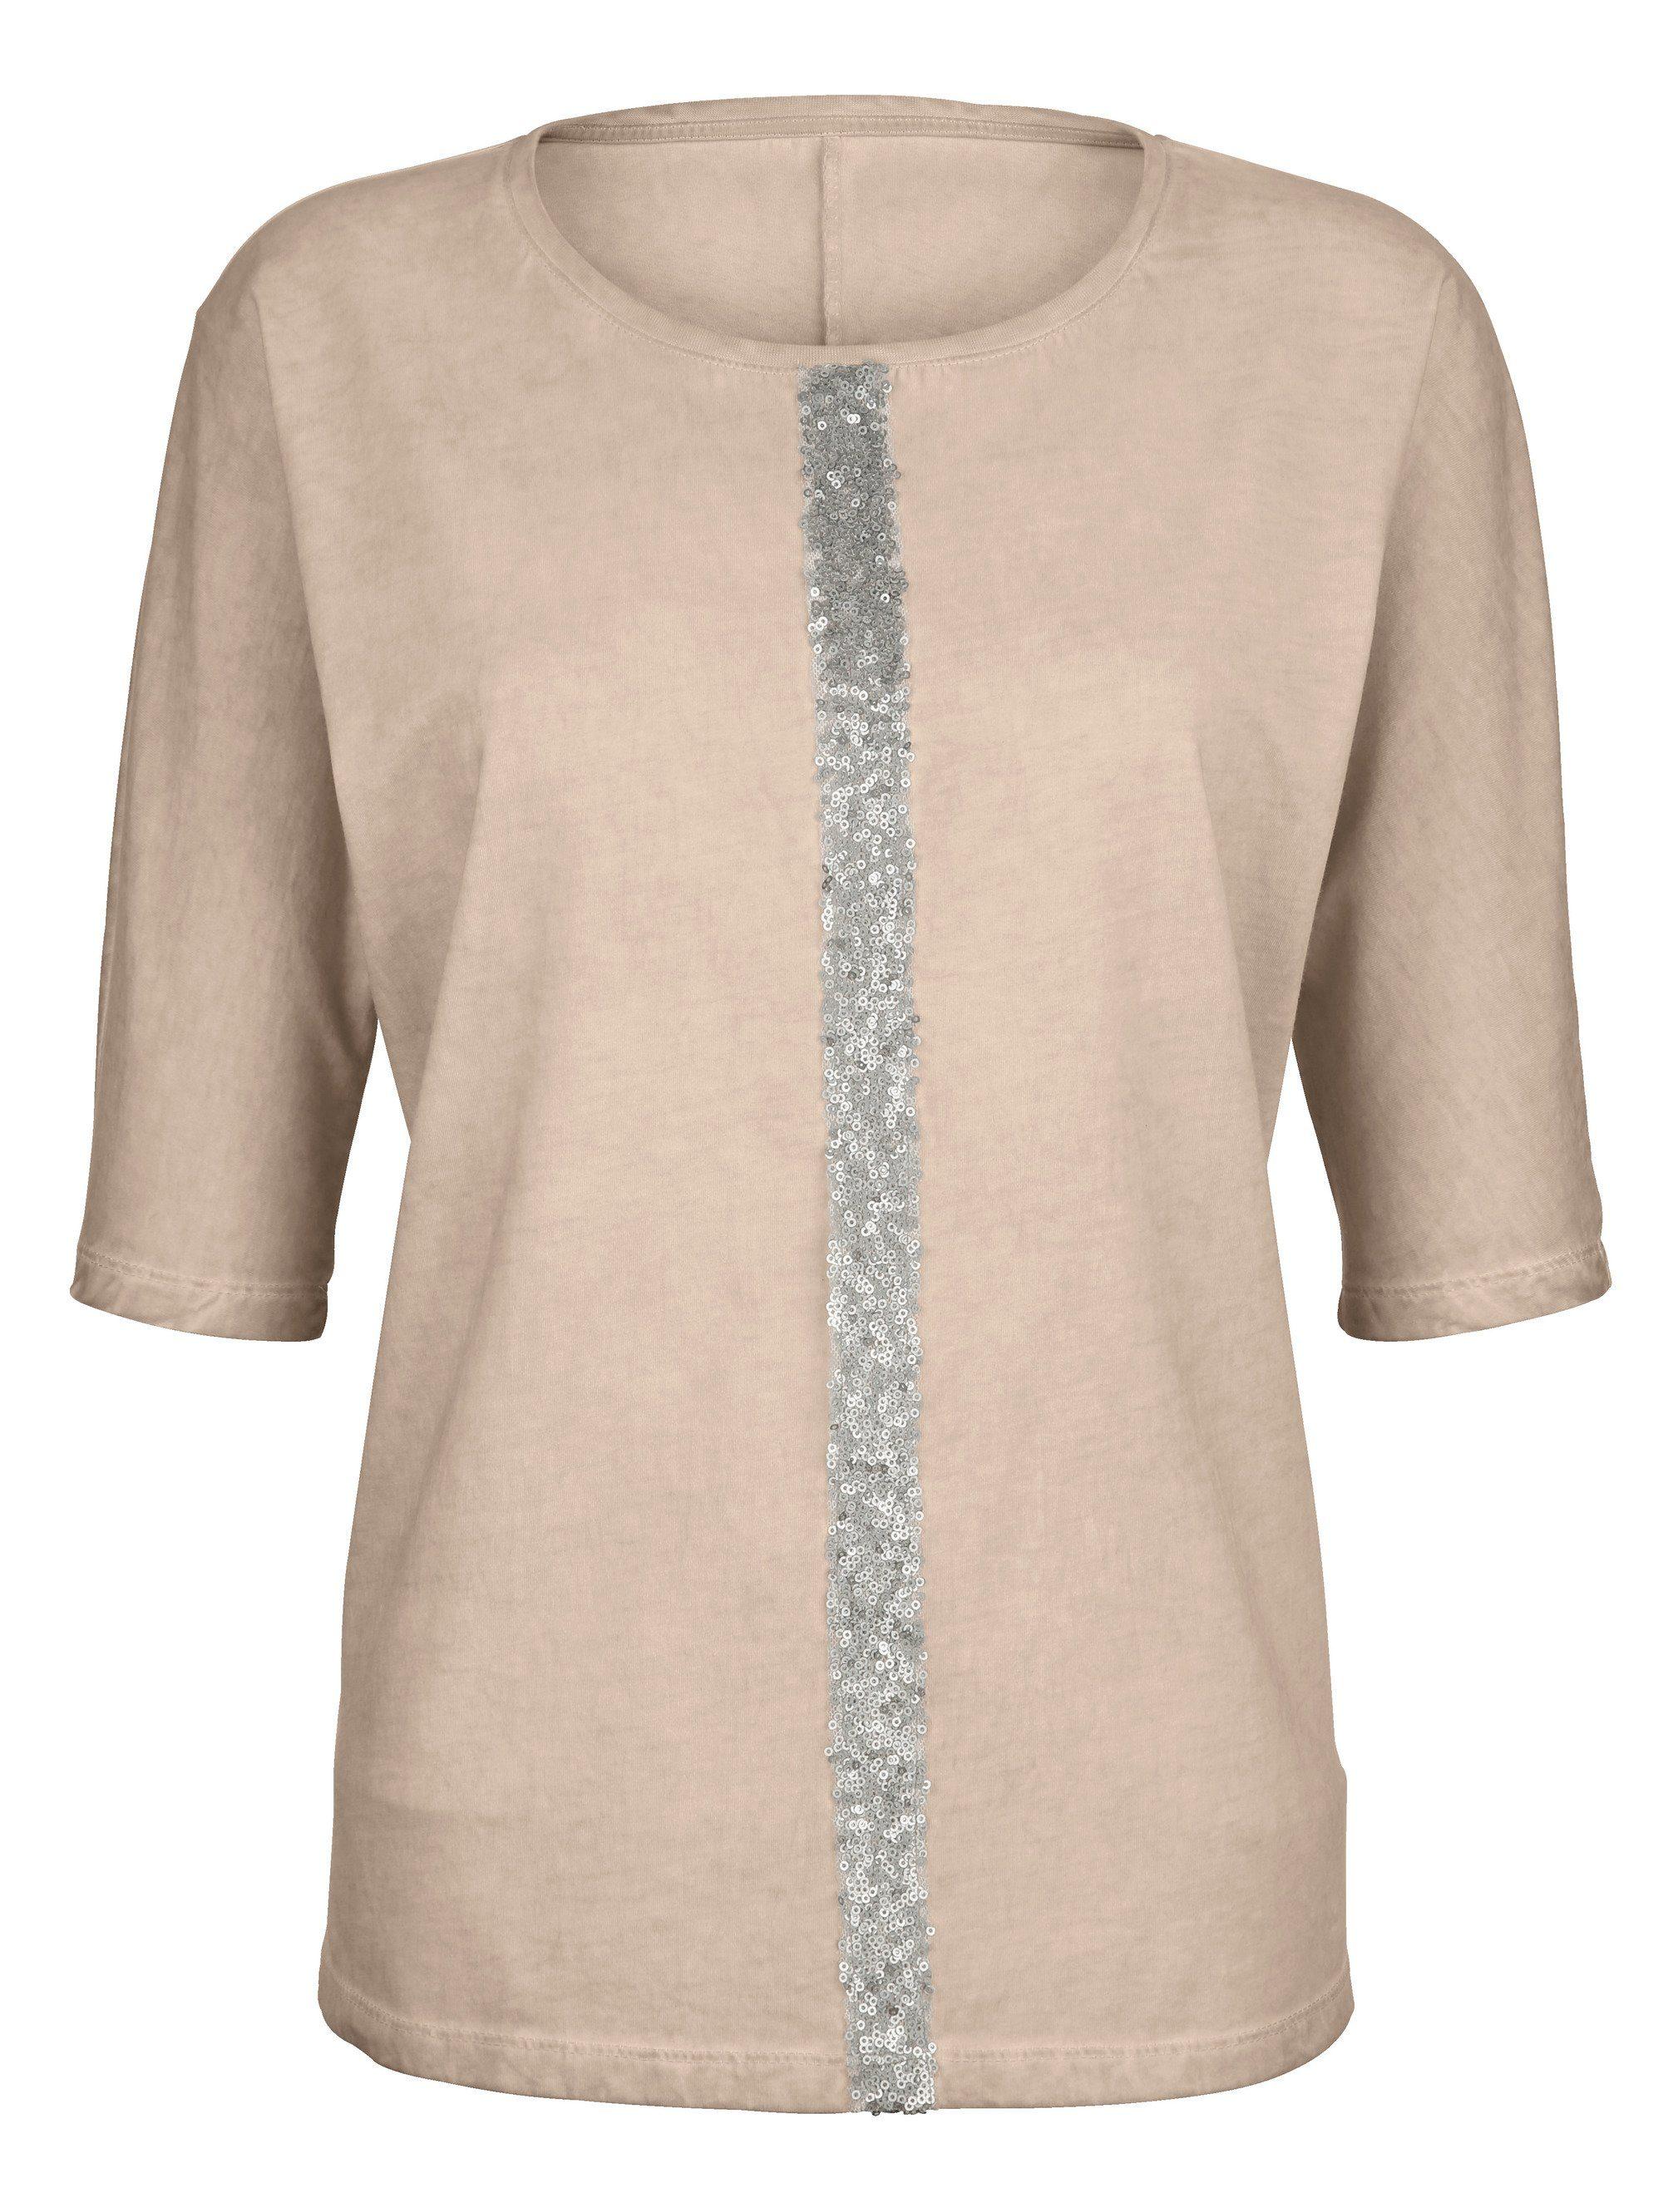 Kleidung & Accessoires Emporio Armani Gr.38 100%seide Jacke Blume Beige Zip Durable In Use